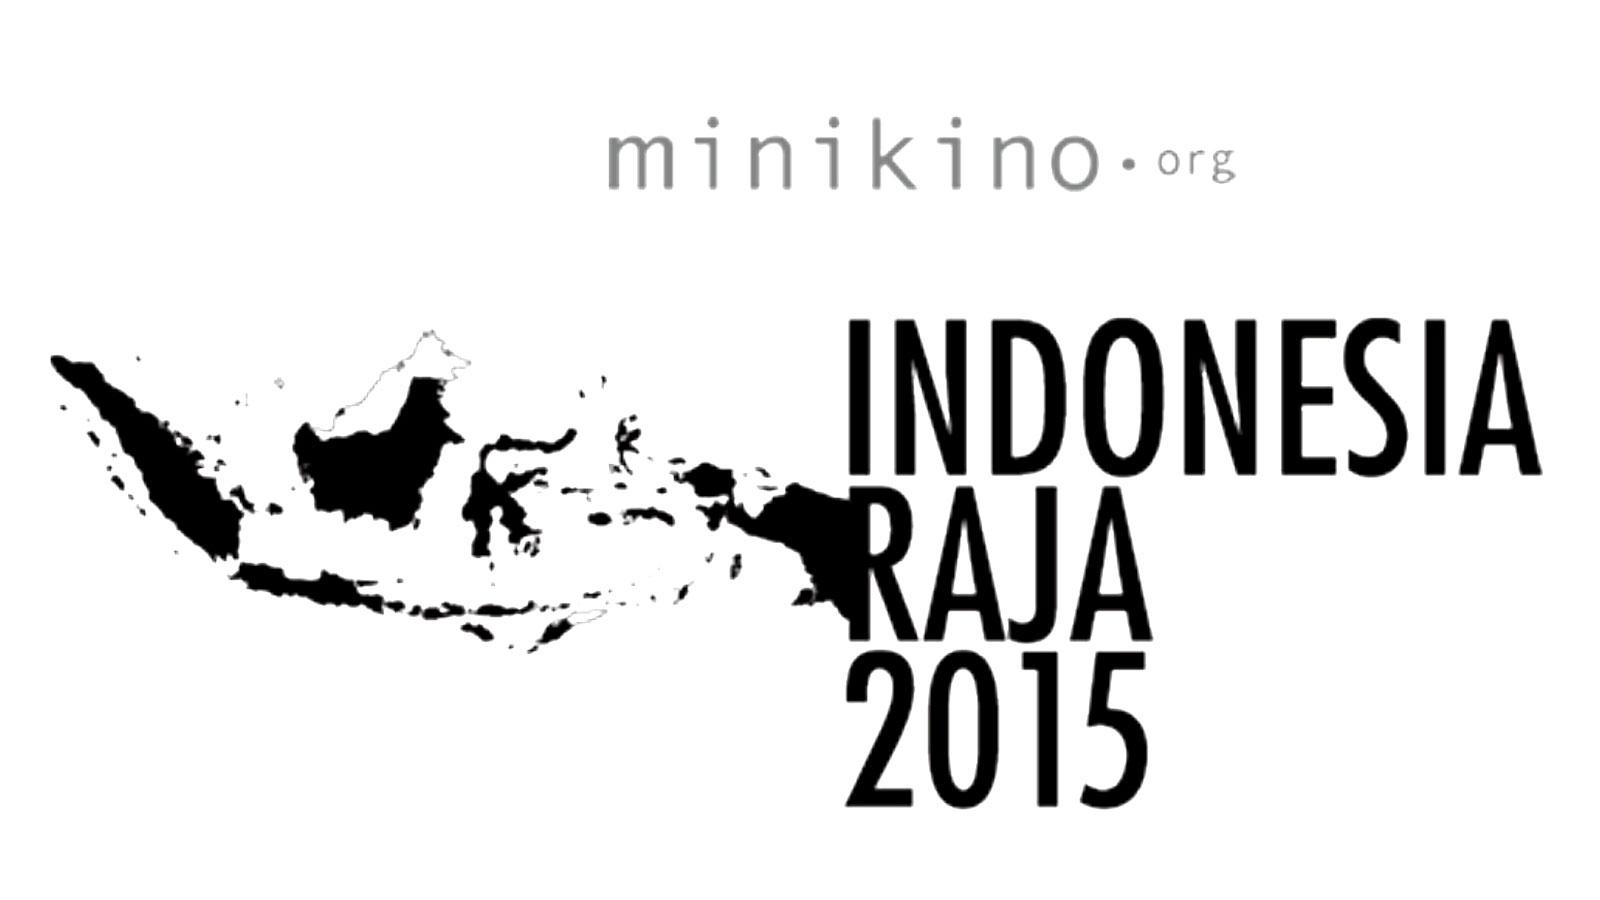 indonesia-raja-2015_hlgh